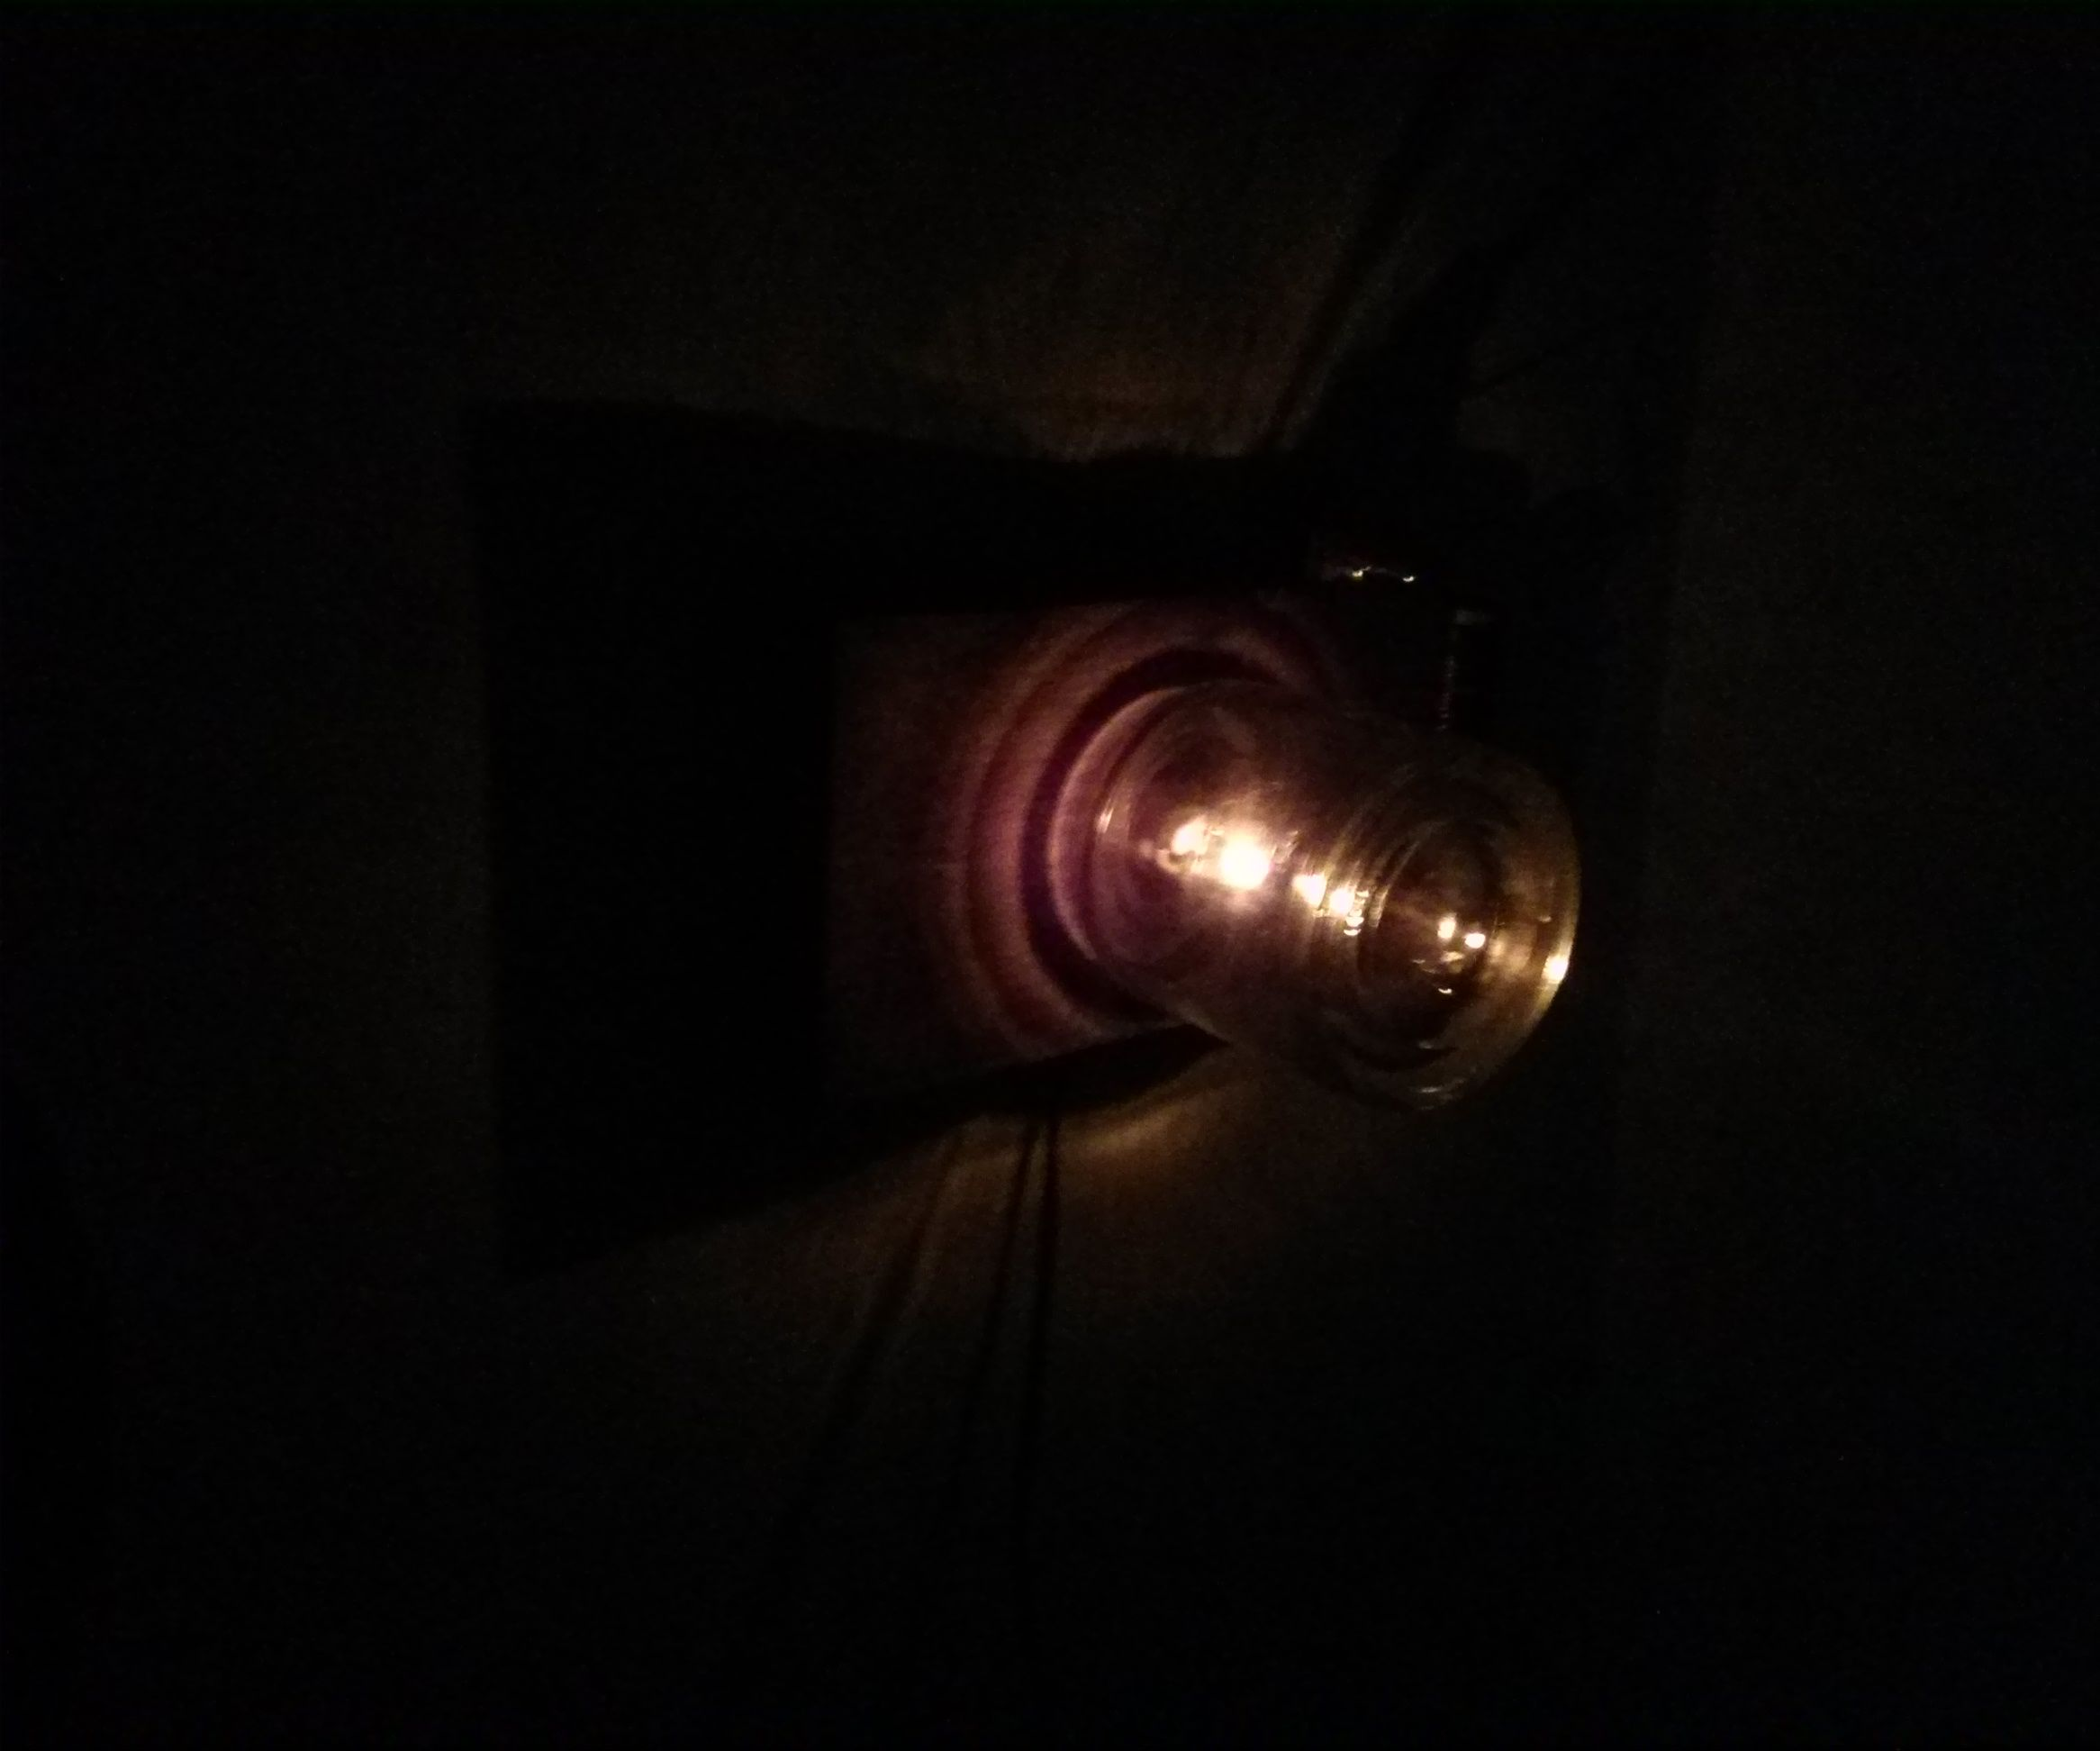 DIY Steampunk candle light lamp